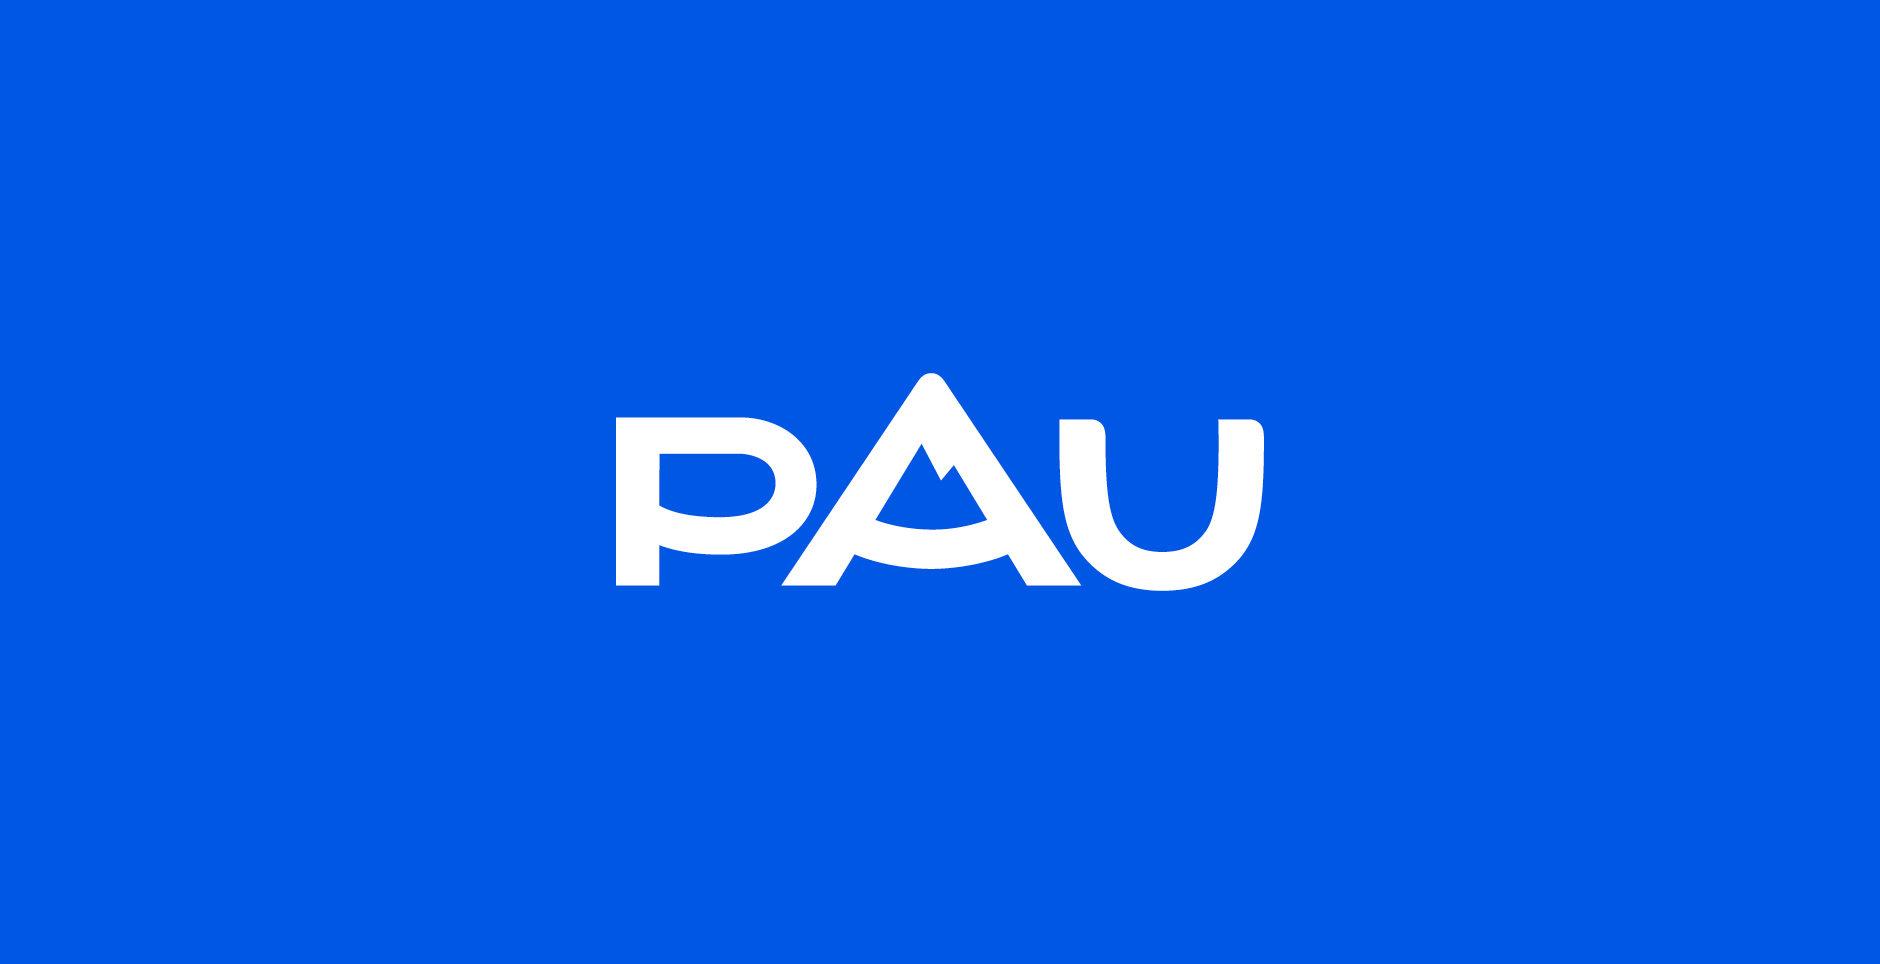 Case_study_Pau2